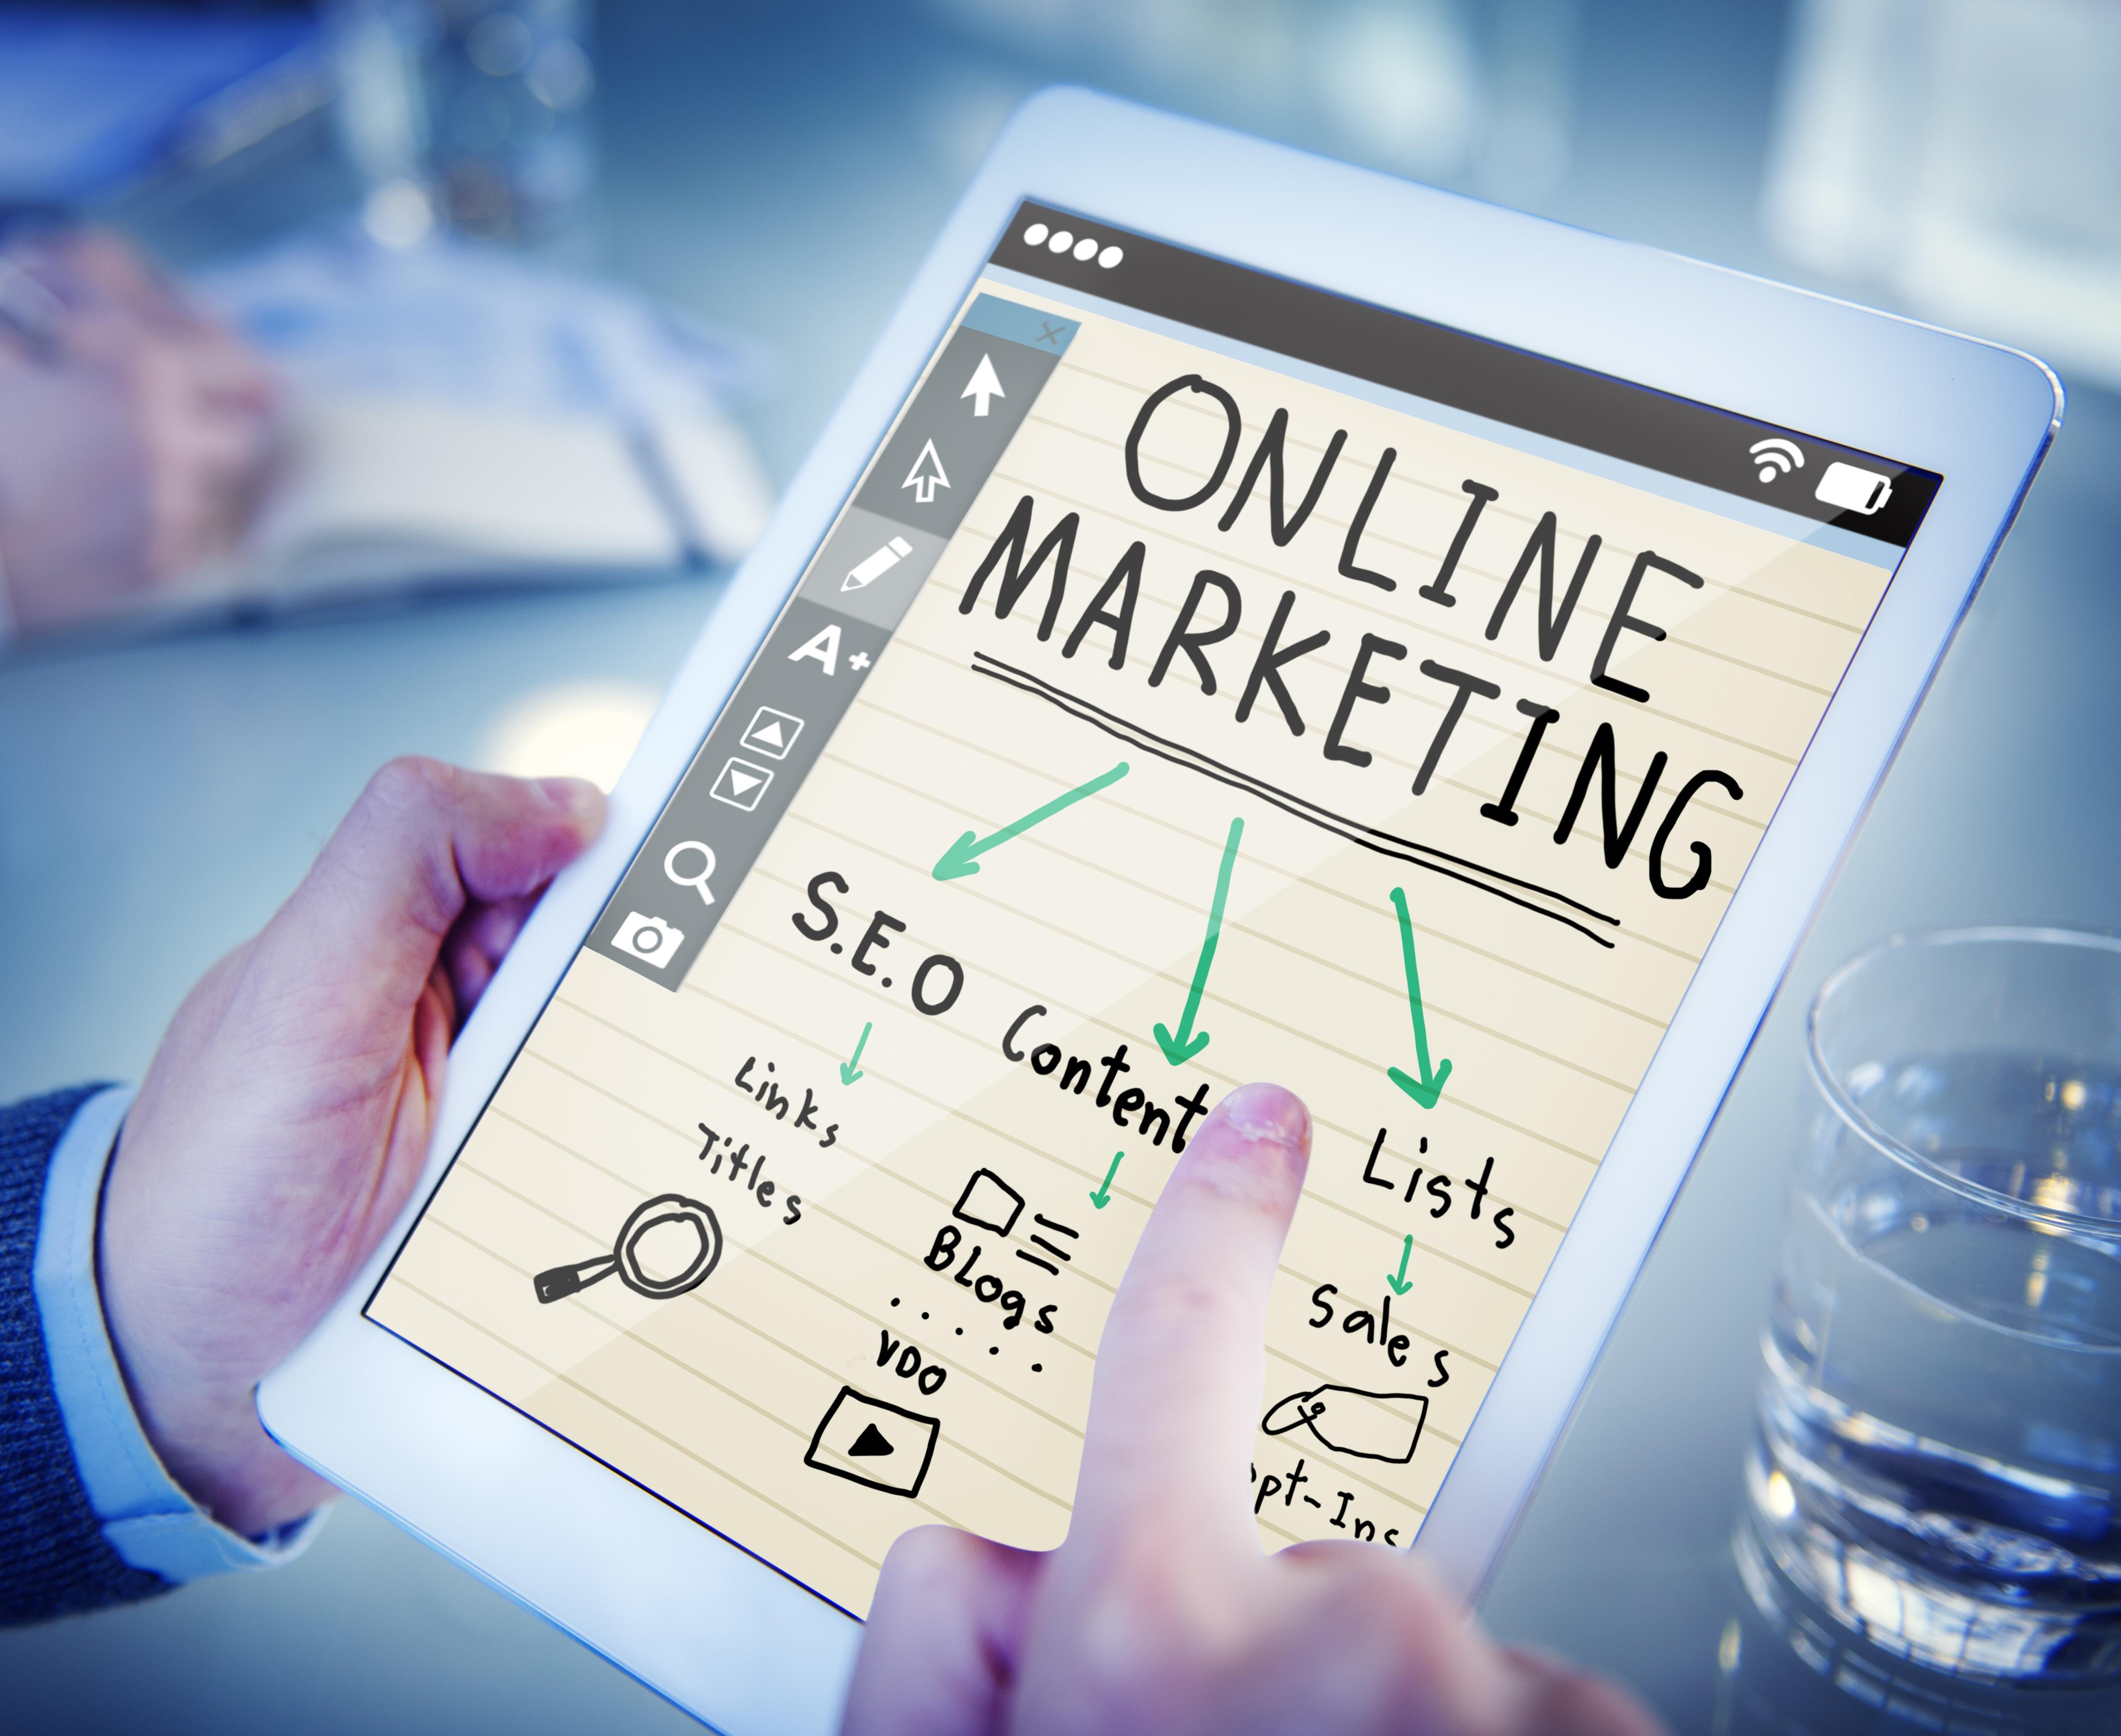 Gambar tangan jaringan Internet bisnis situs web merek on #0: hand web internet business website brand marketing online digital marketing seo search engine optimization internet marketing online marketing